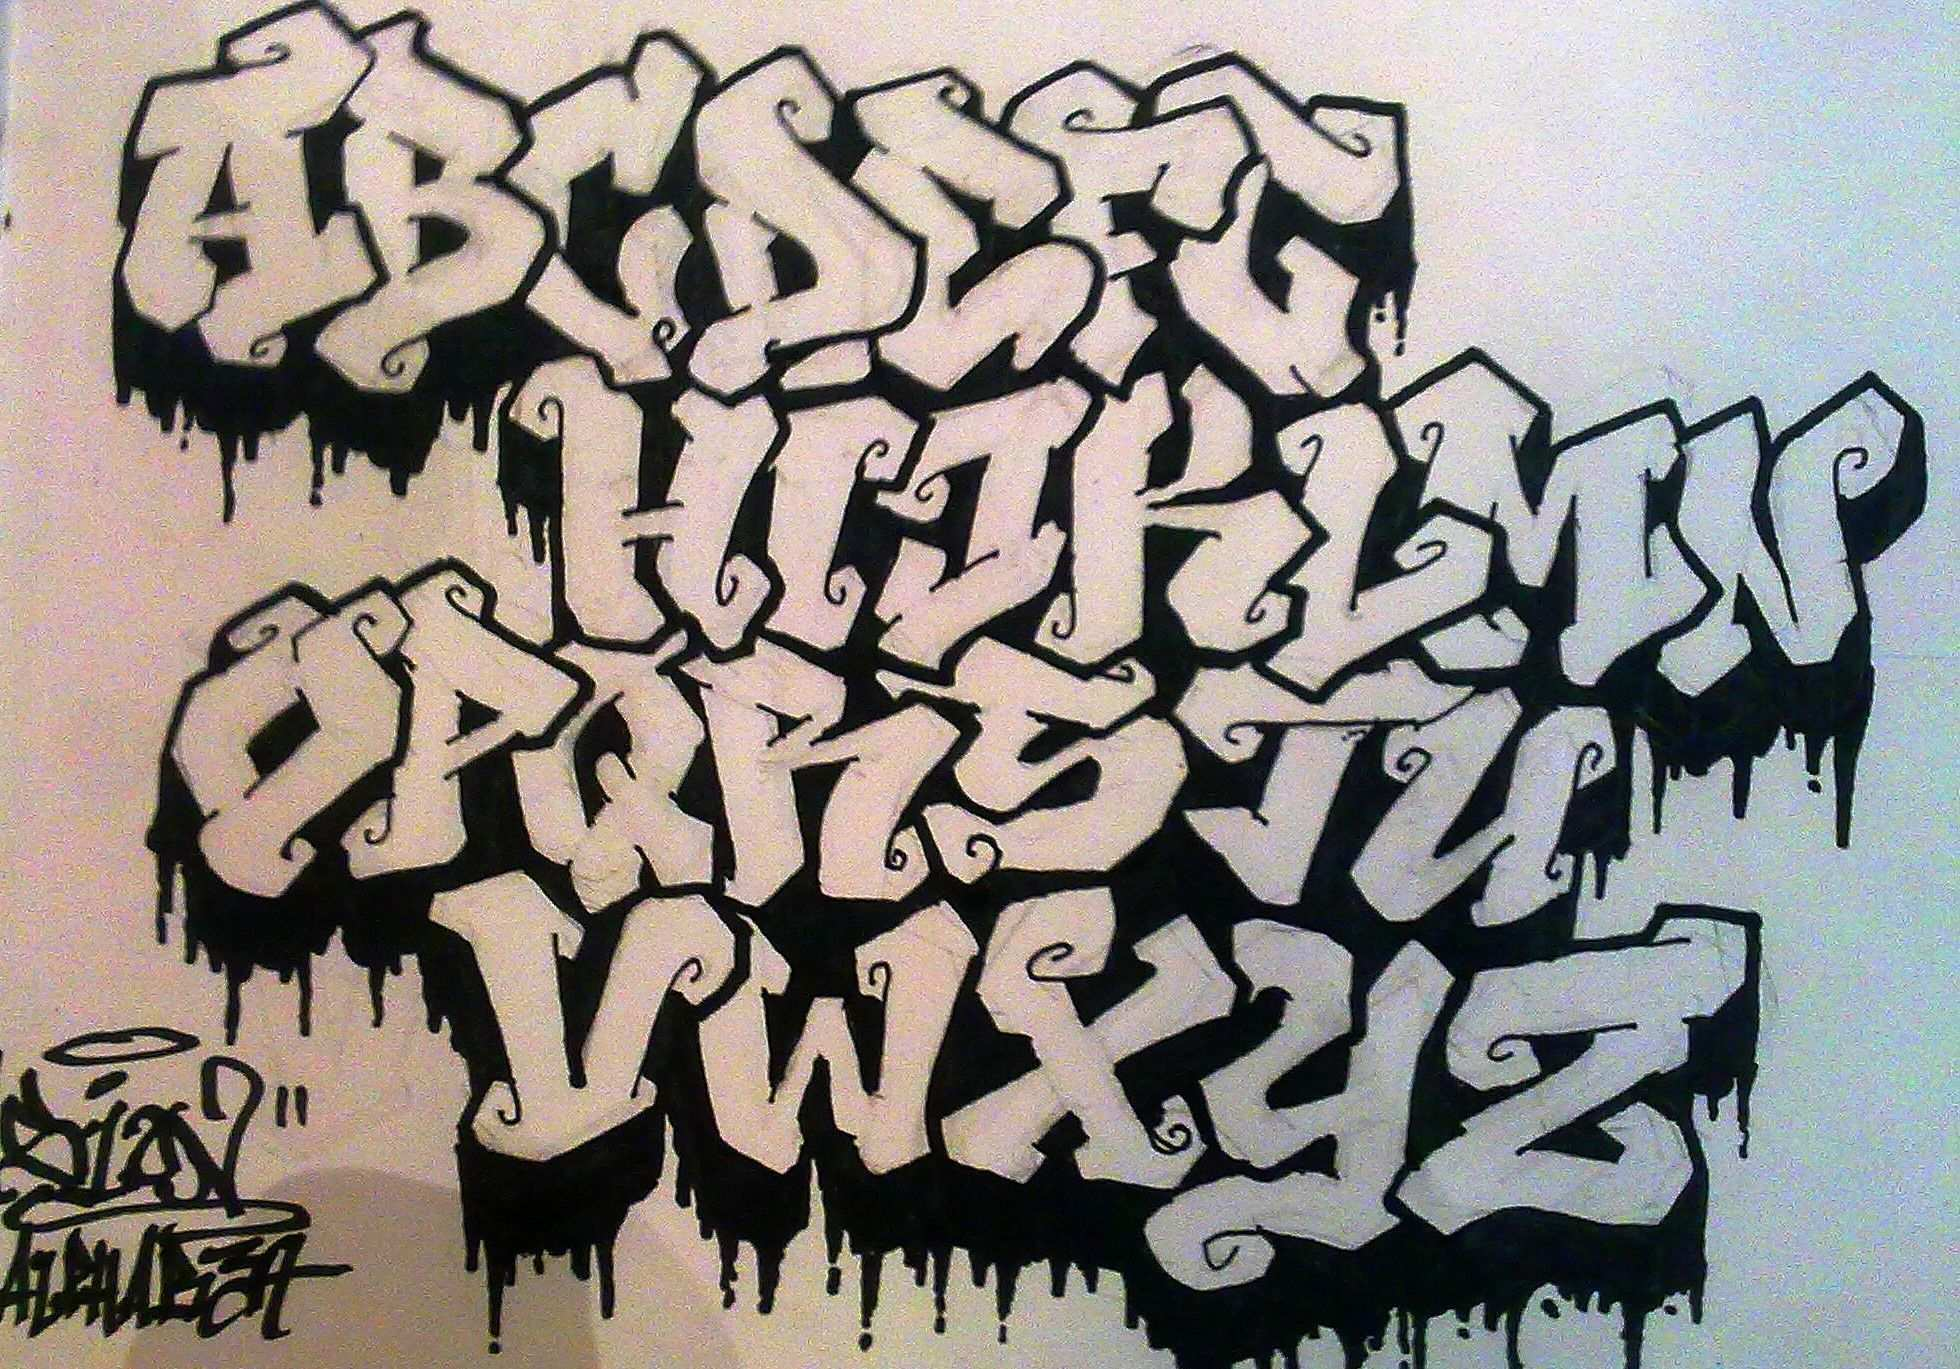 Image Result For Graffiti Vorlagen Graffiti Lettering Alphabet Graffiti Alphabet Styles Graffiti Lettering Fonts